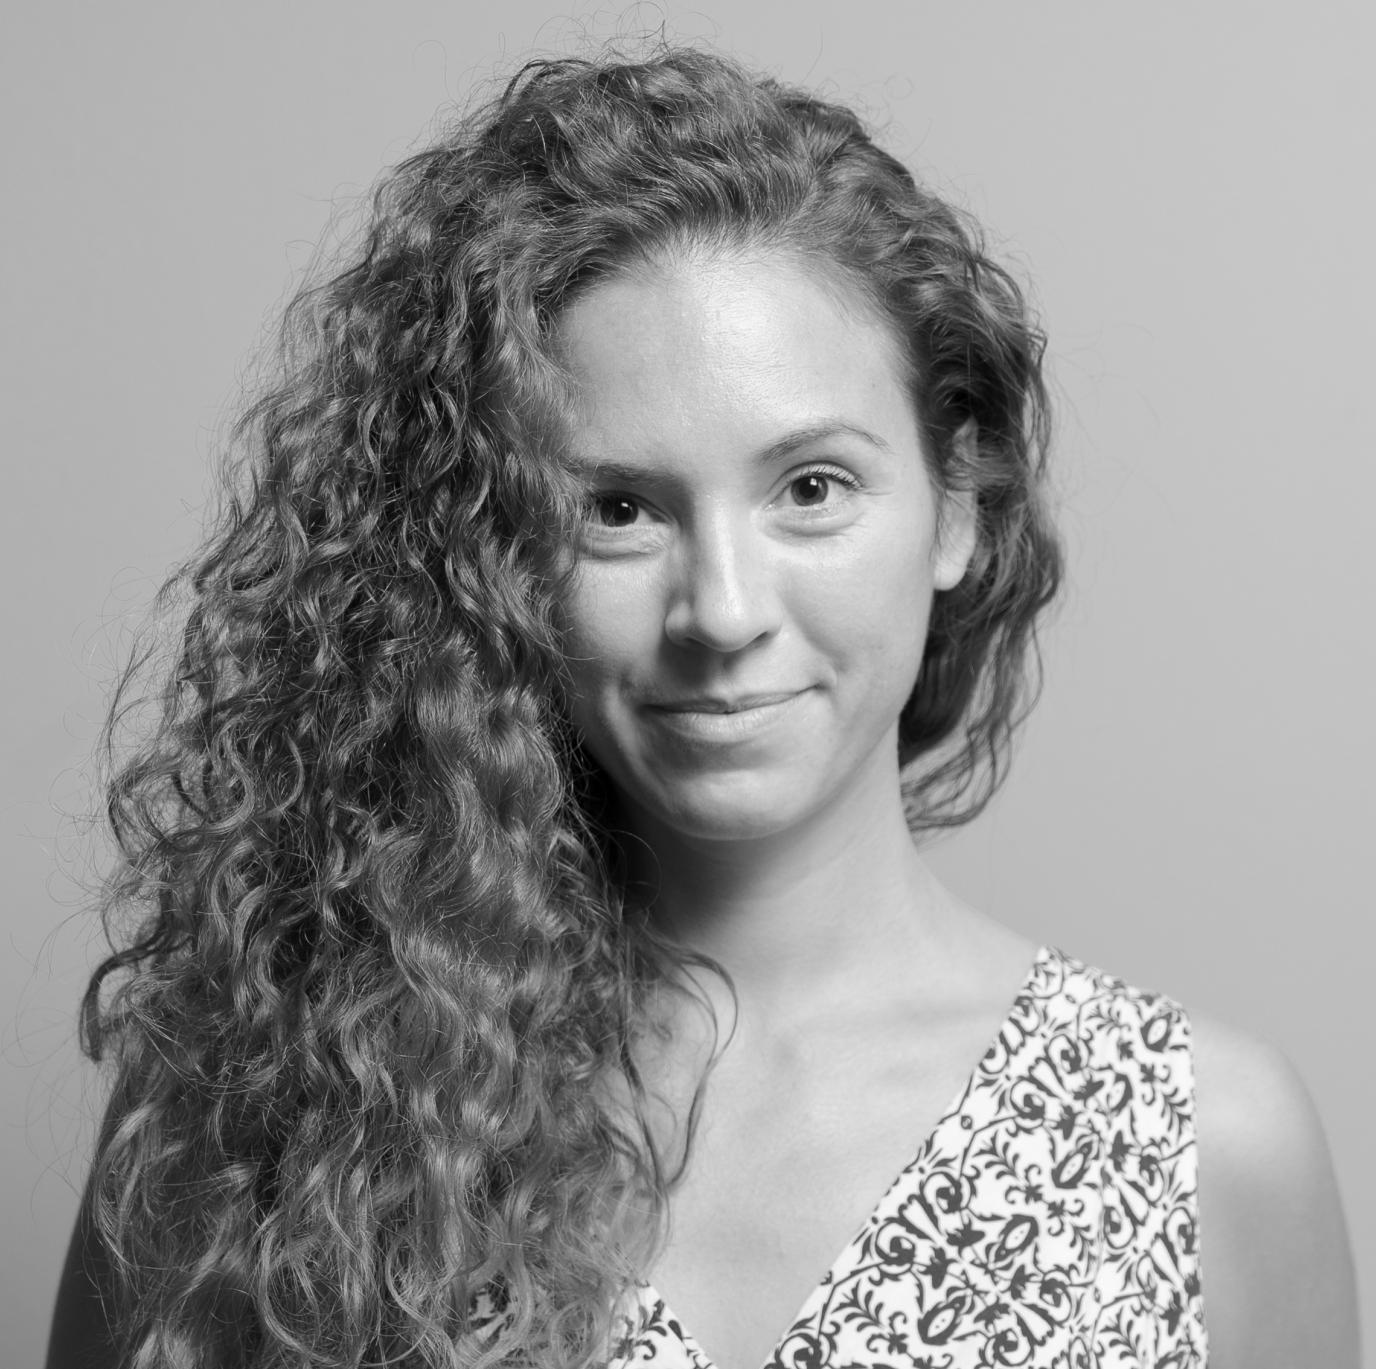 Caterina Obbia